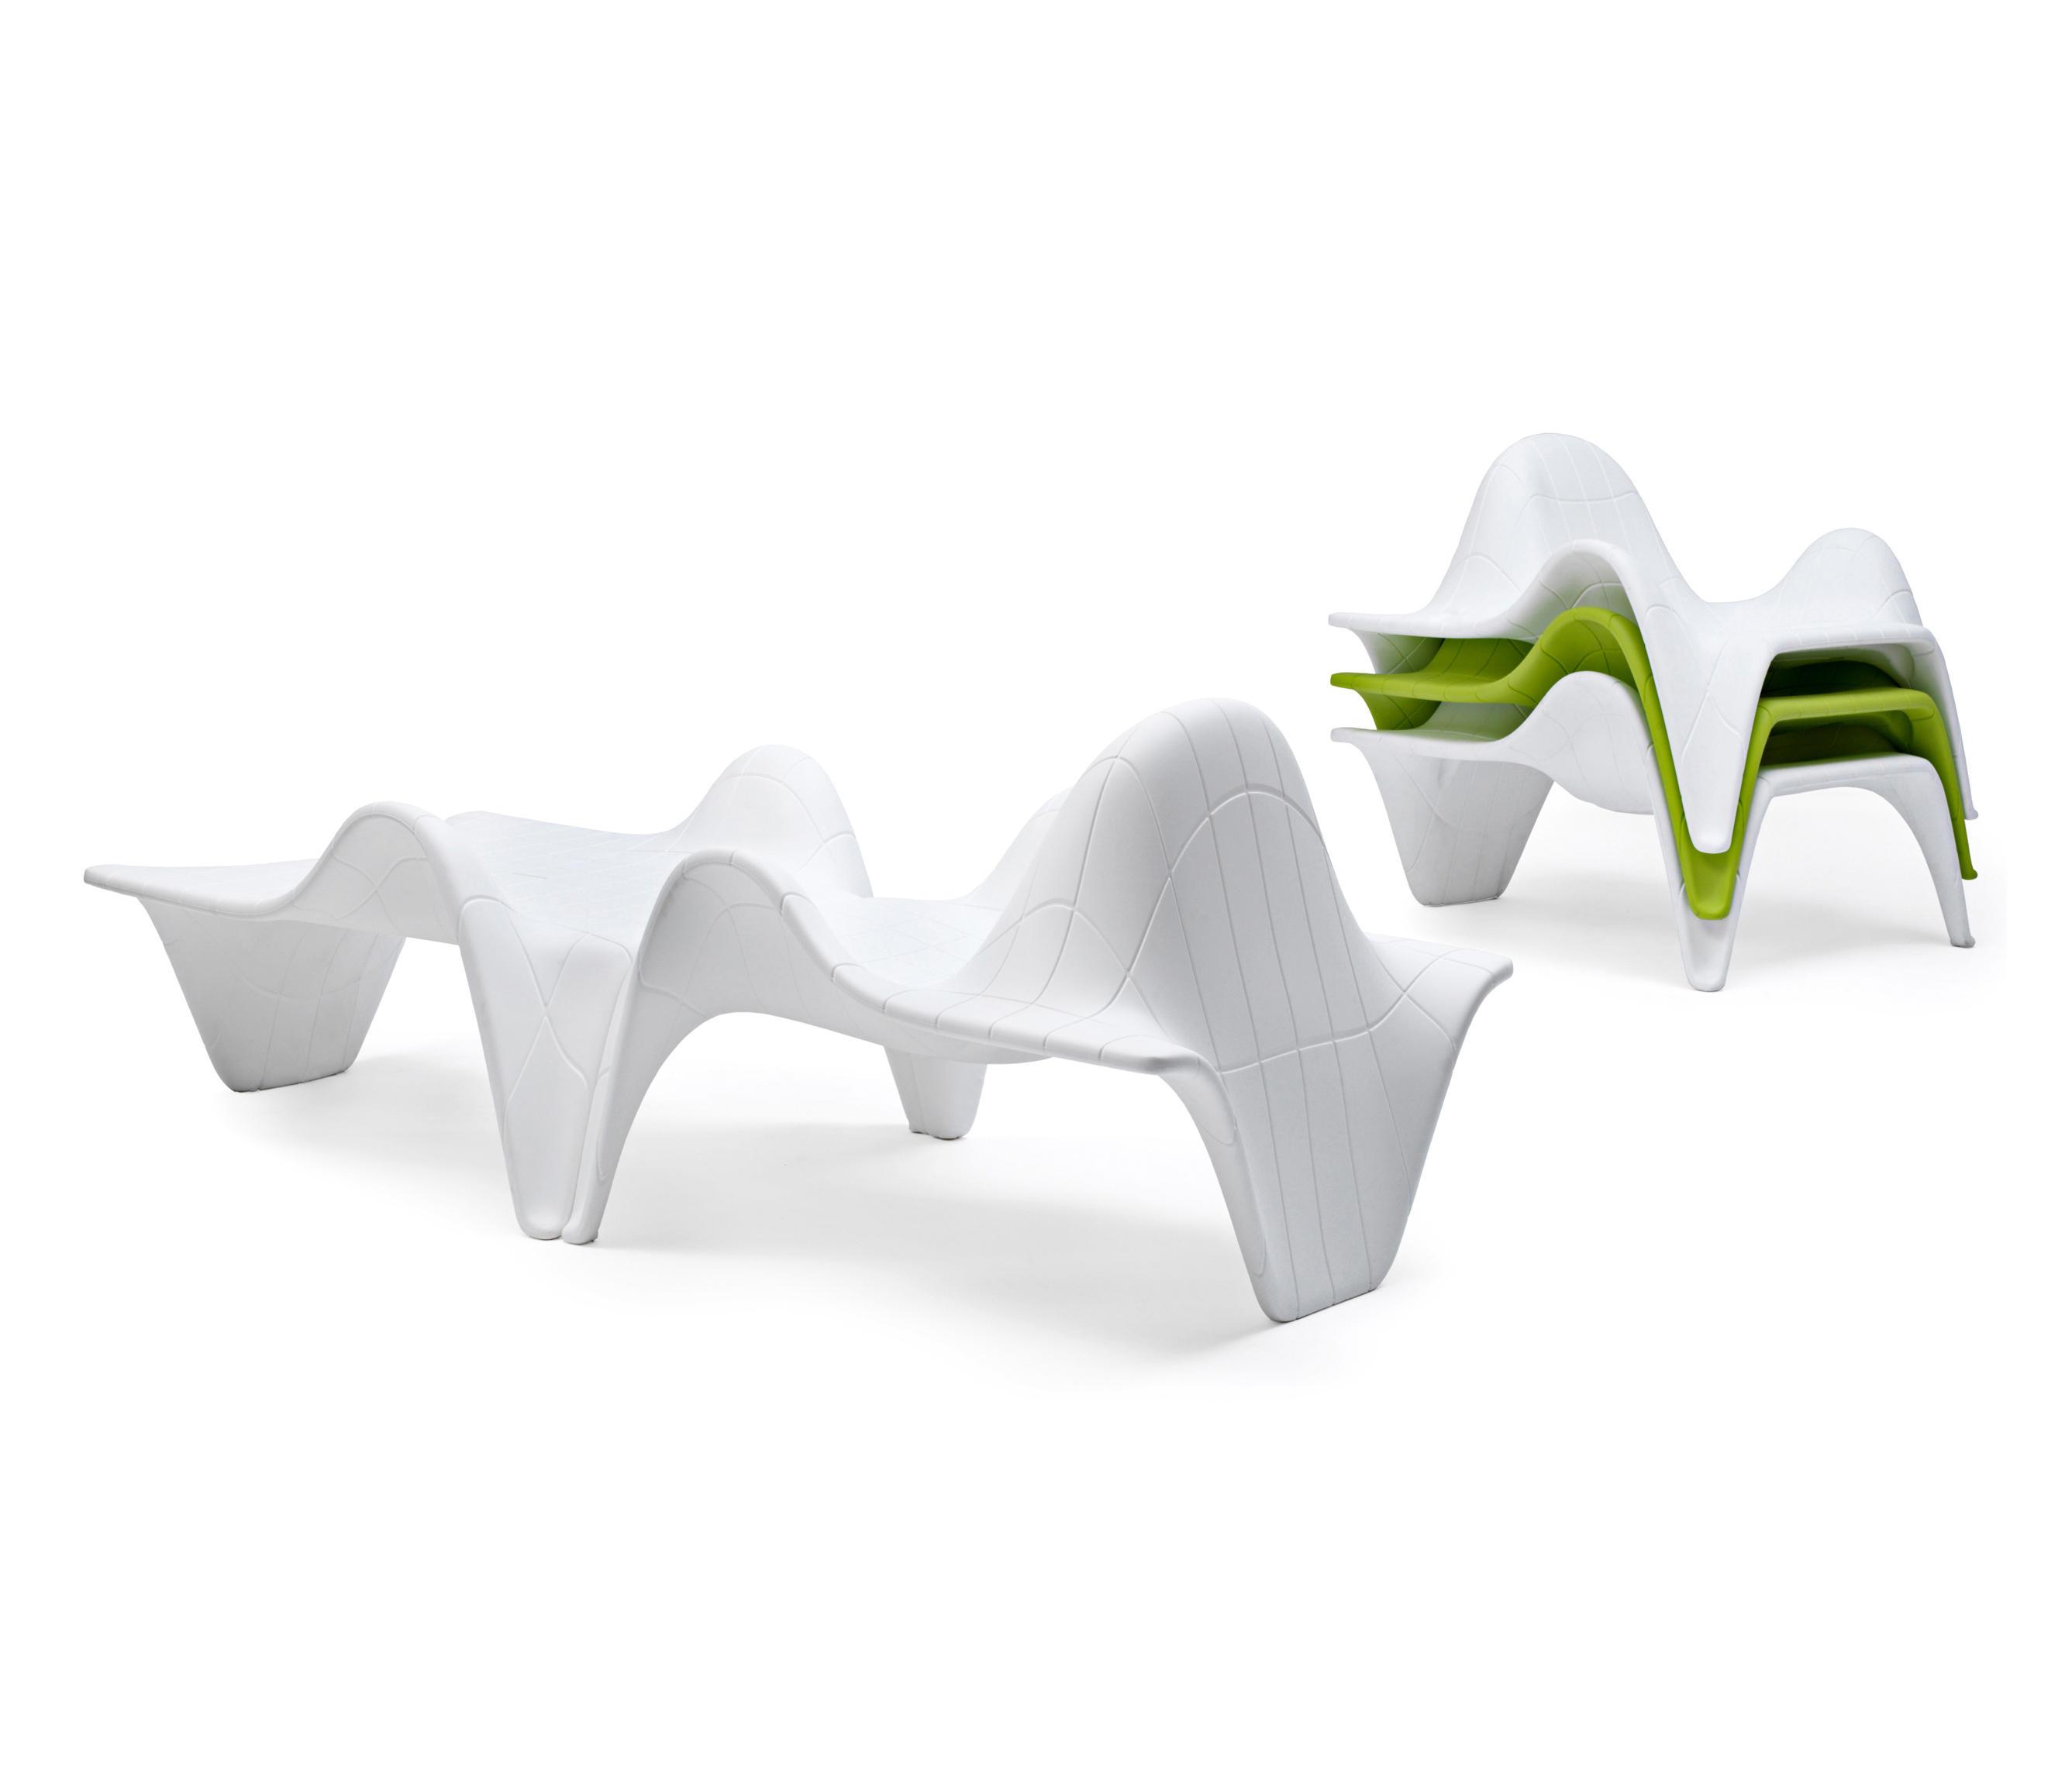 f3 armchair garden armchairs from vondom architonic. Black Bedroom Furniture Sets. Home Design Ideas